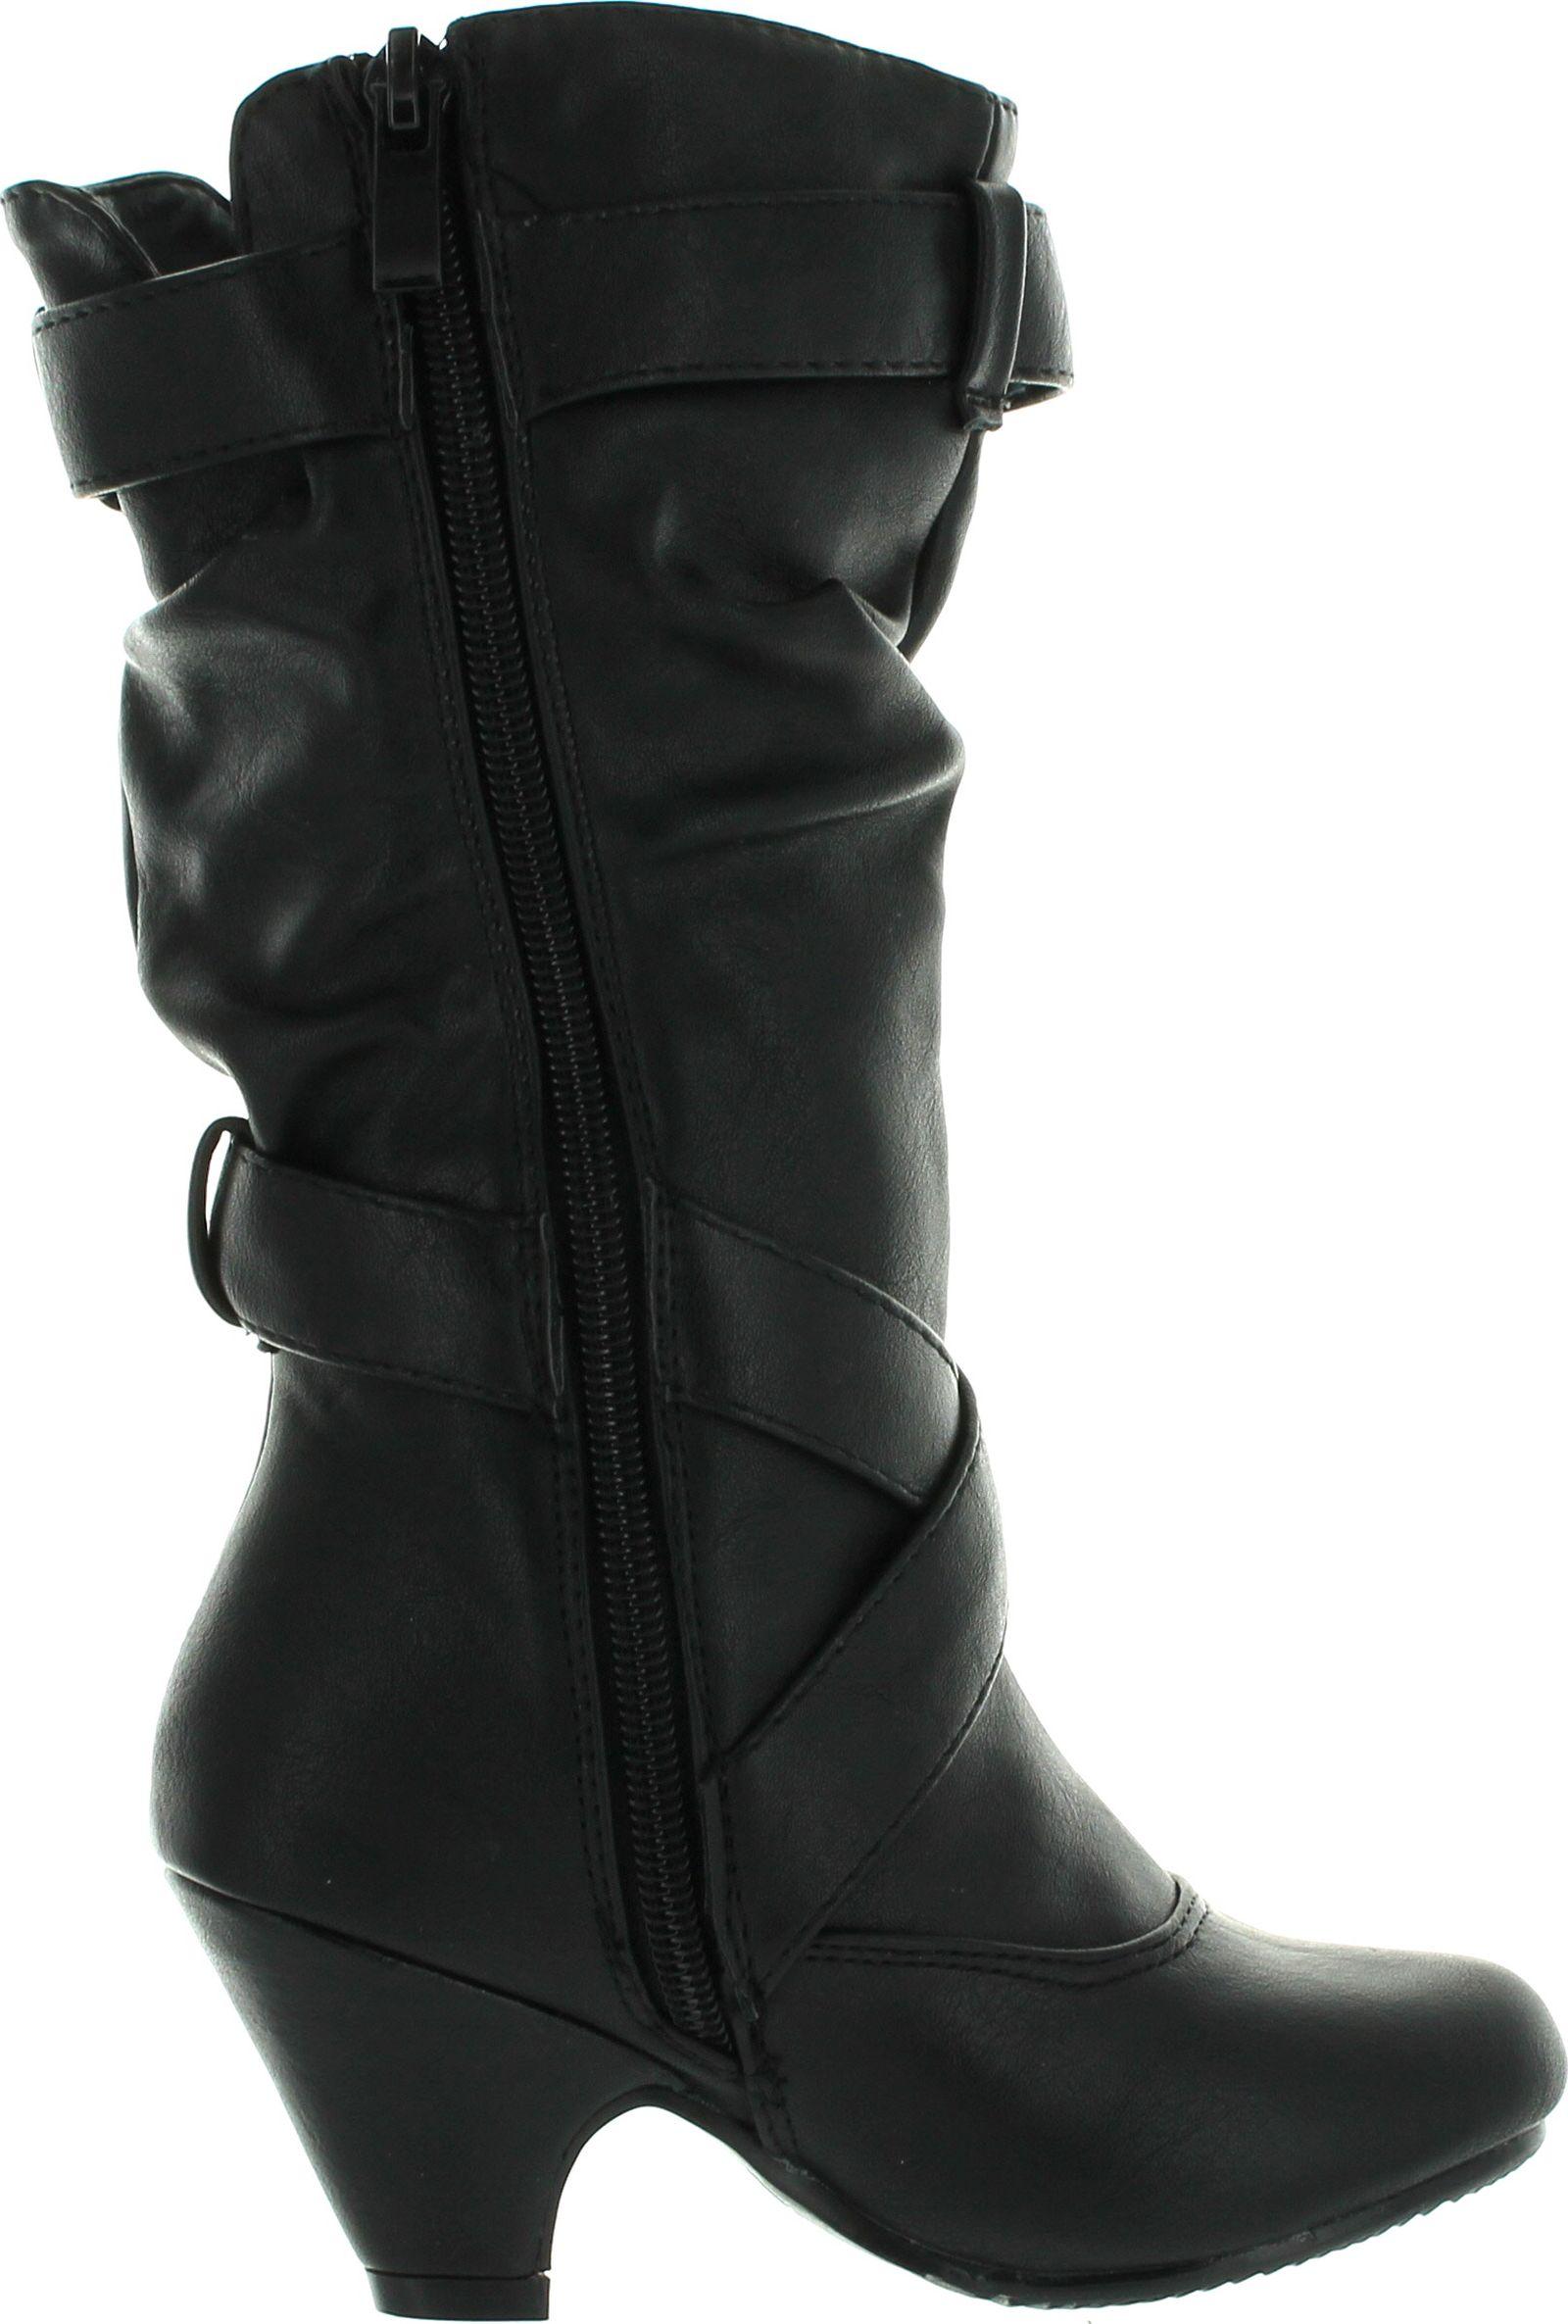 Link Little Girl's Pauline-38 Kitten Heel Boots With Decorative ...